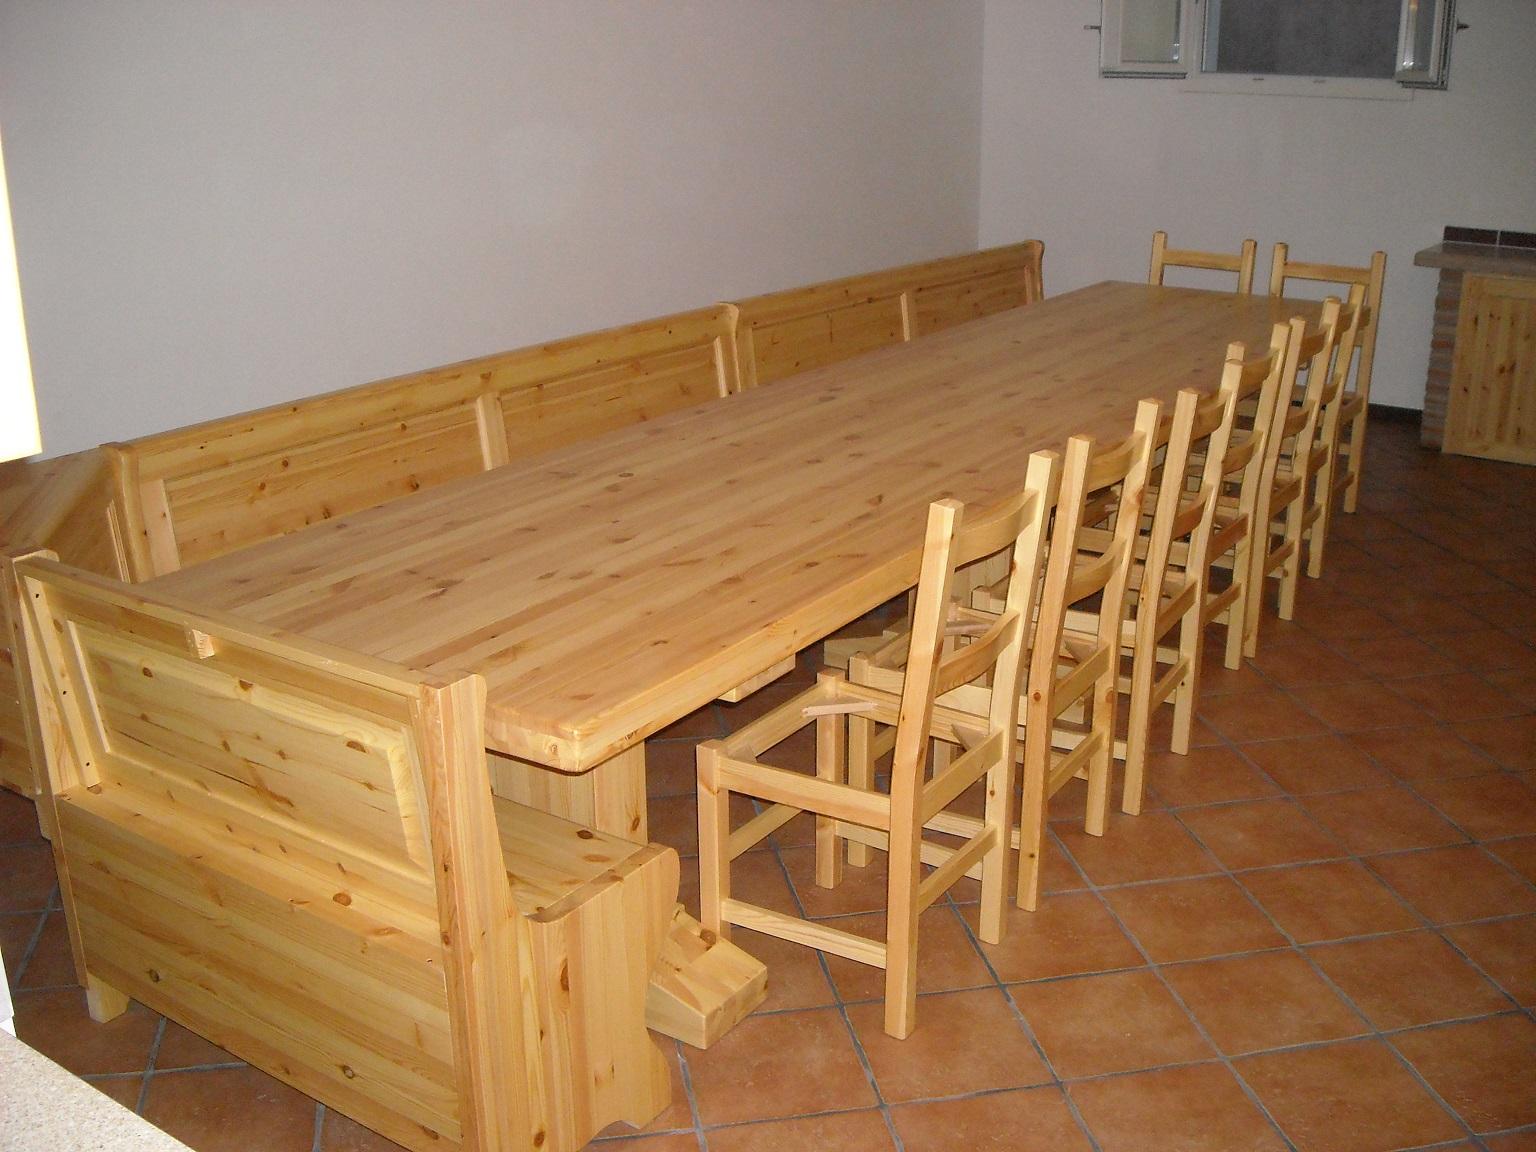 tavolo taverna giro panca venezia ESCAPE='HTML'